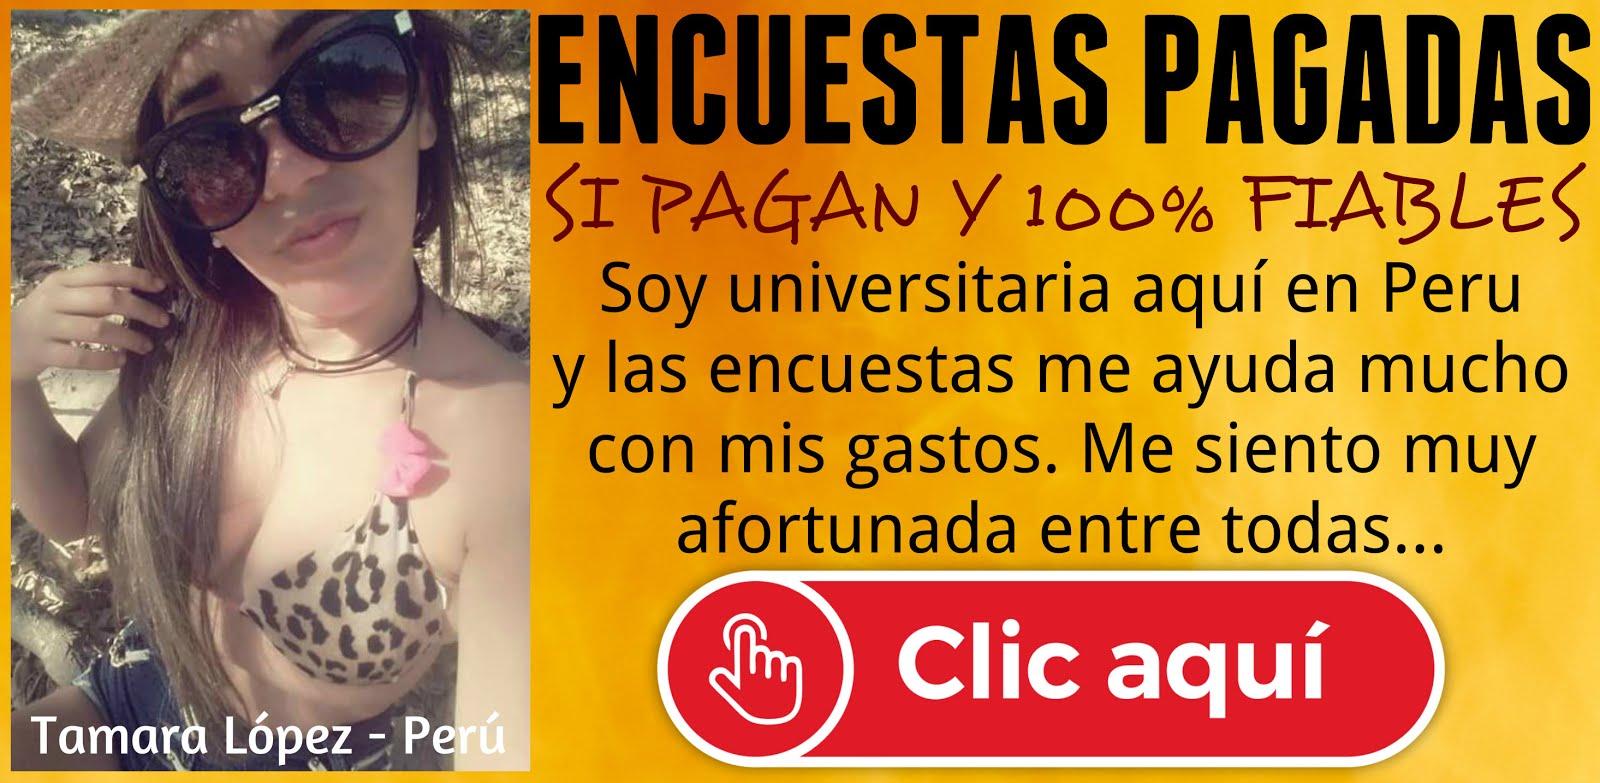 Tamara López - Perú